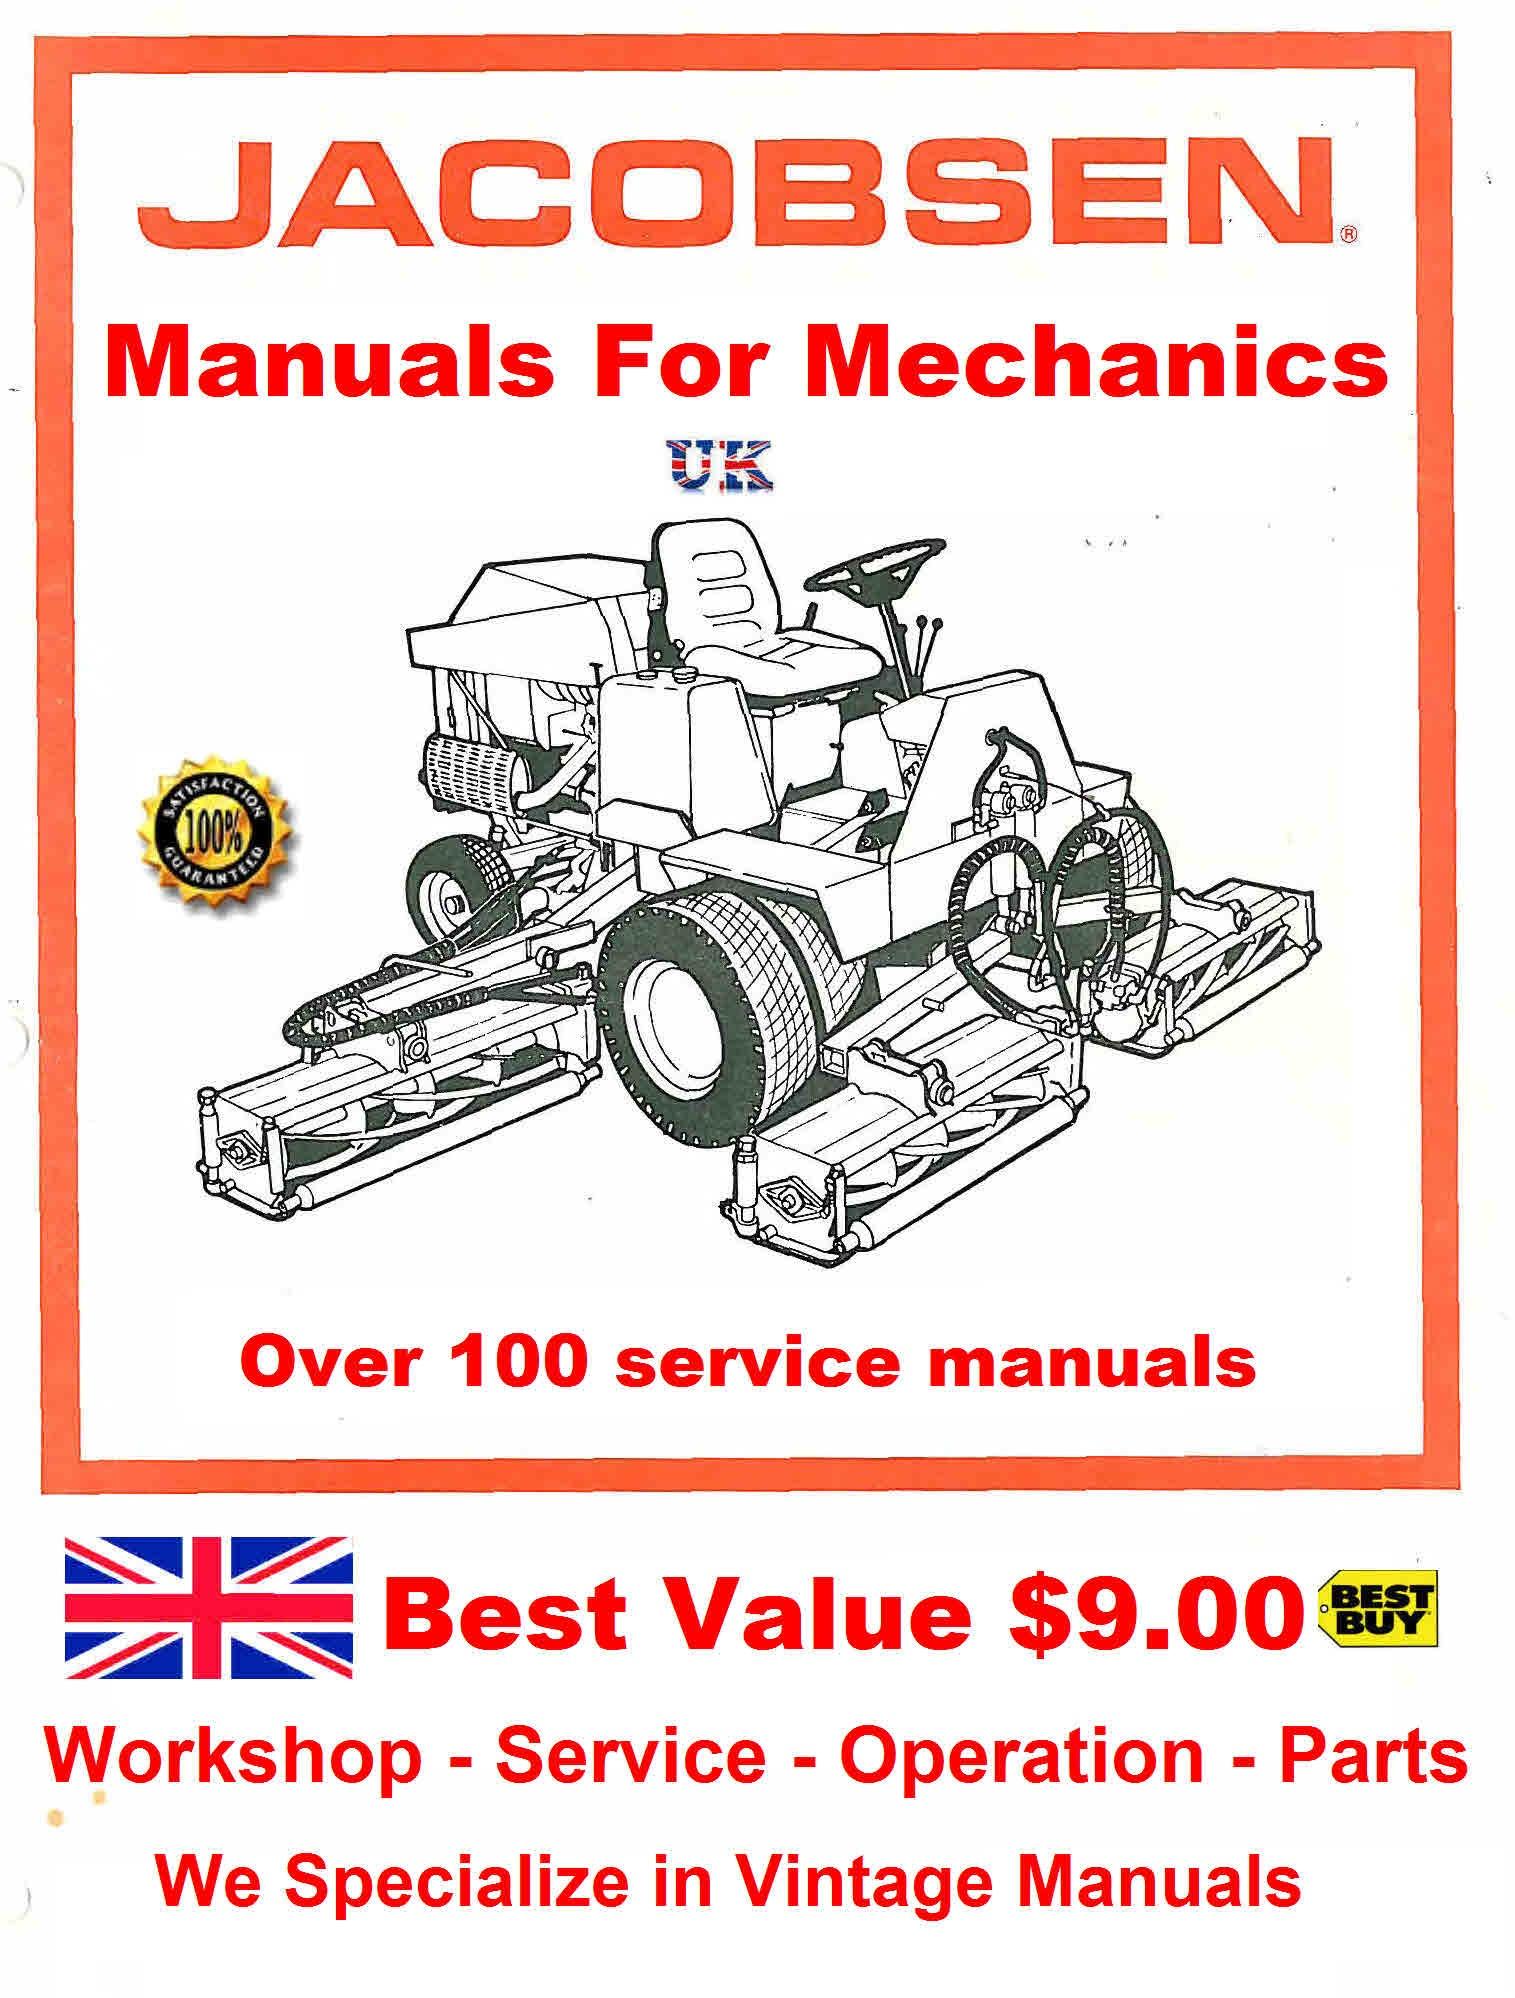 Array - jacabson service manuals for mechanics  rh   sellfy com